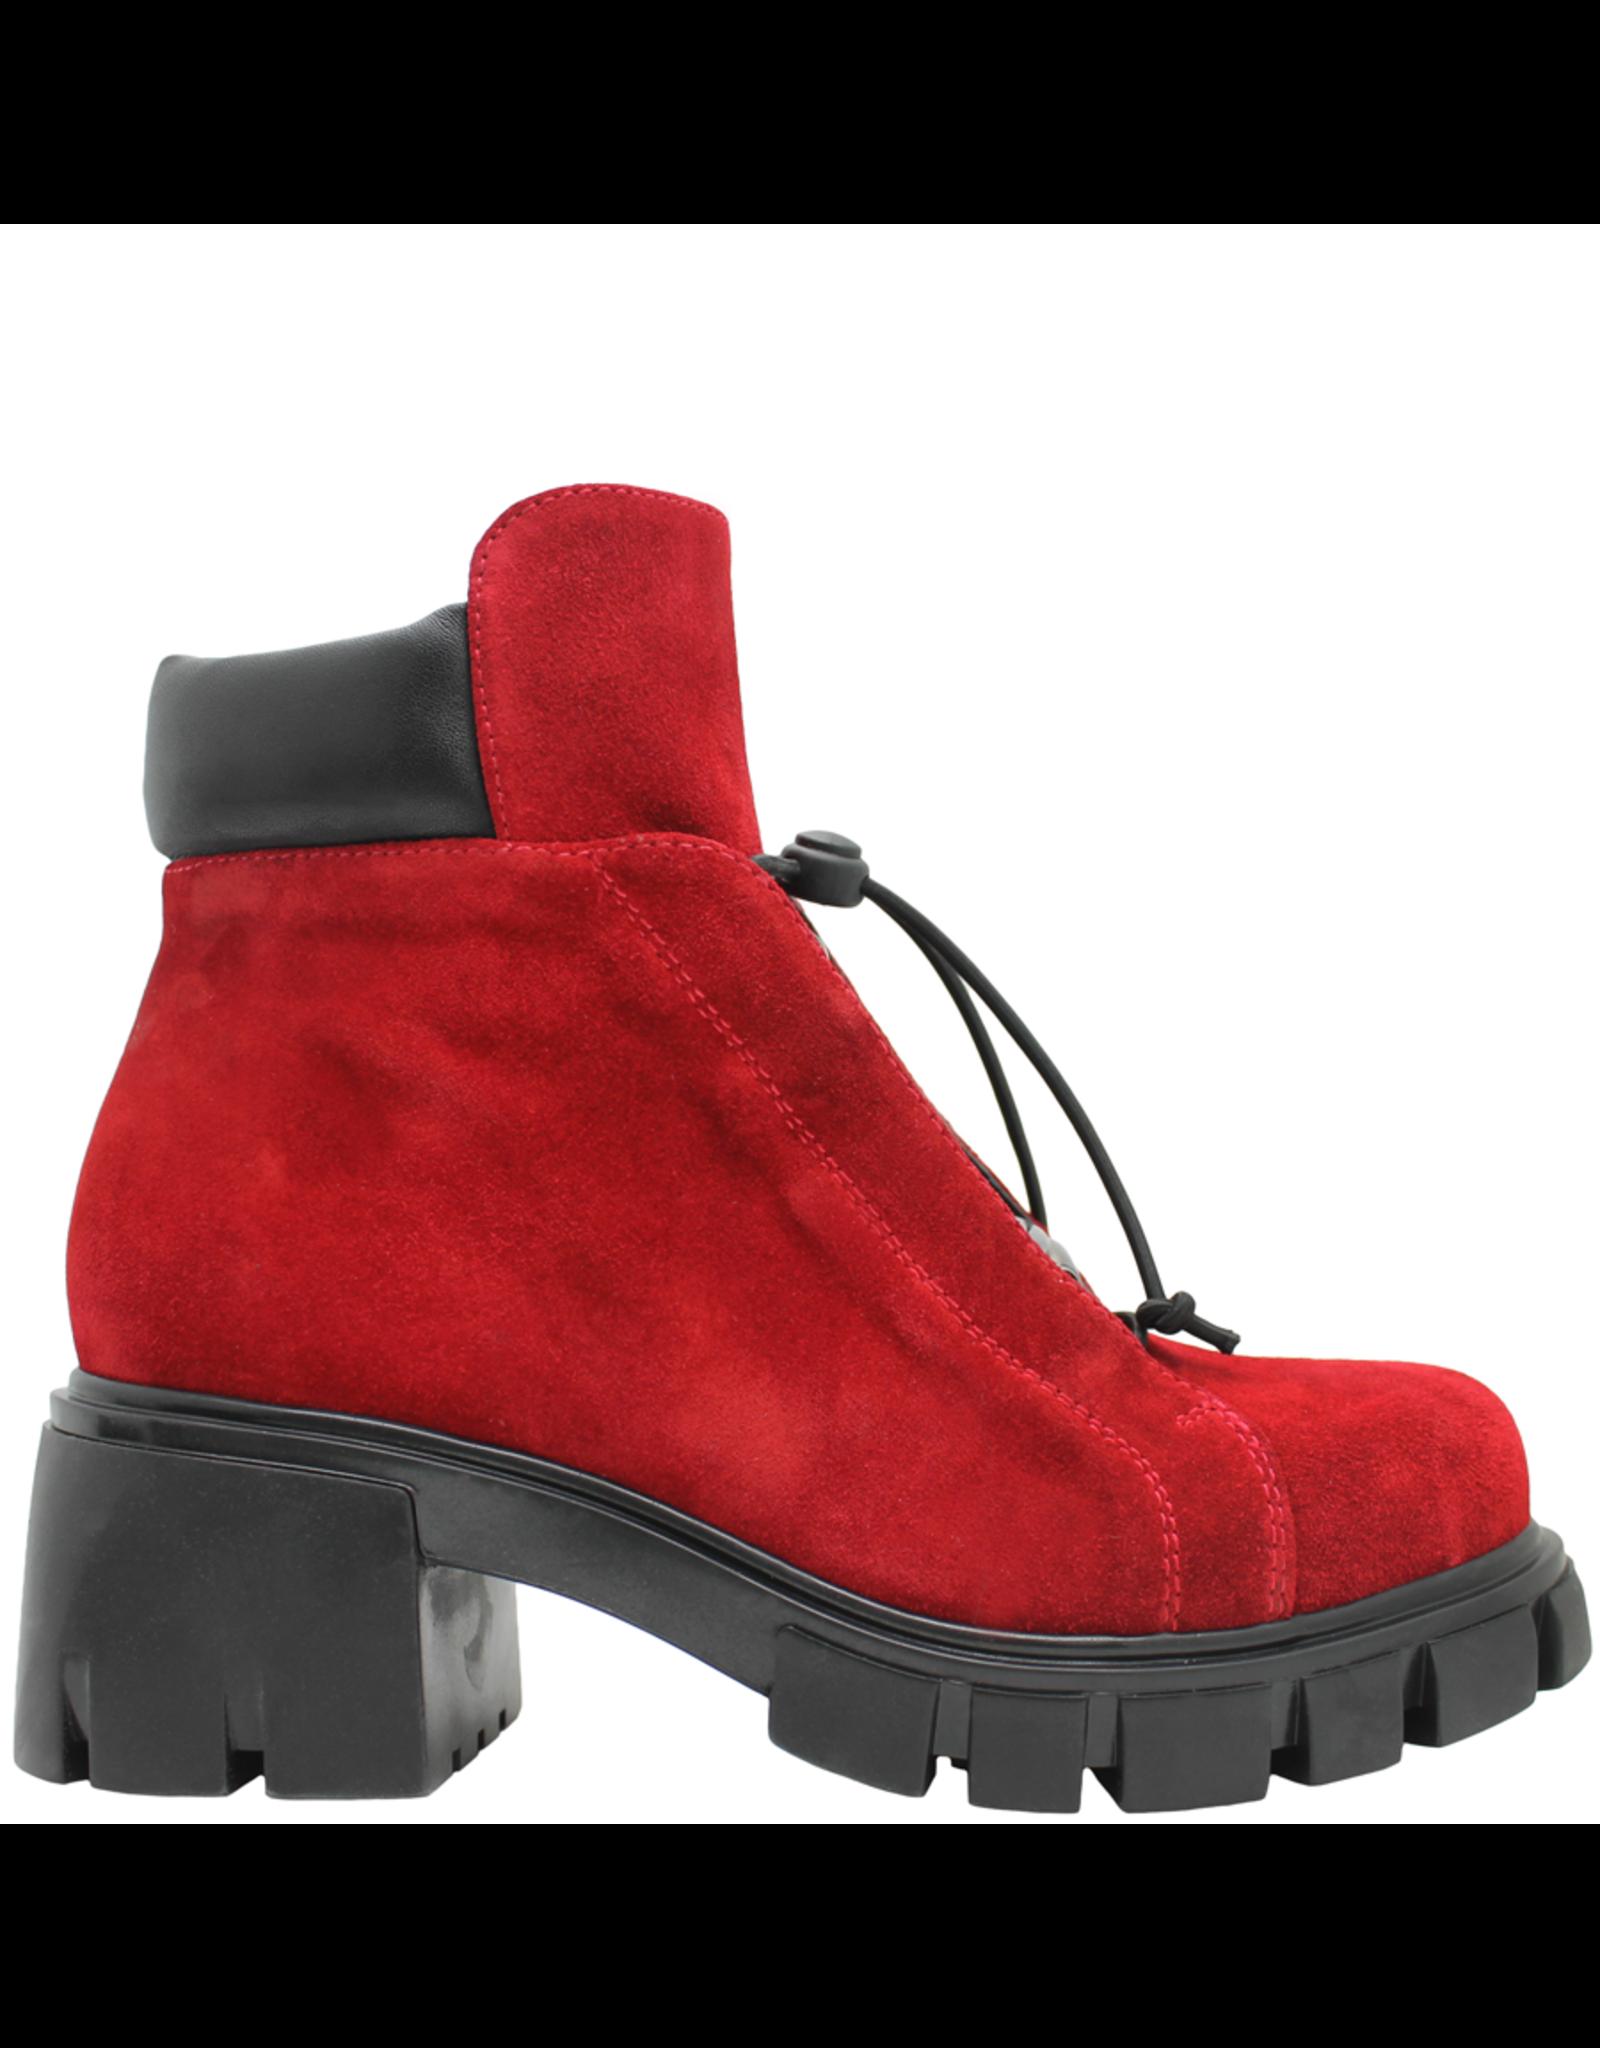 Now Now Red Nubuck Side Zipper Hiker Boot 5677